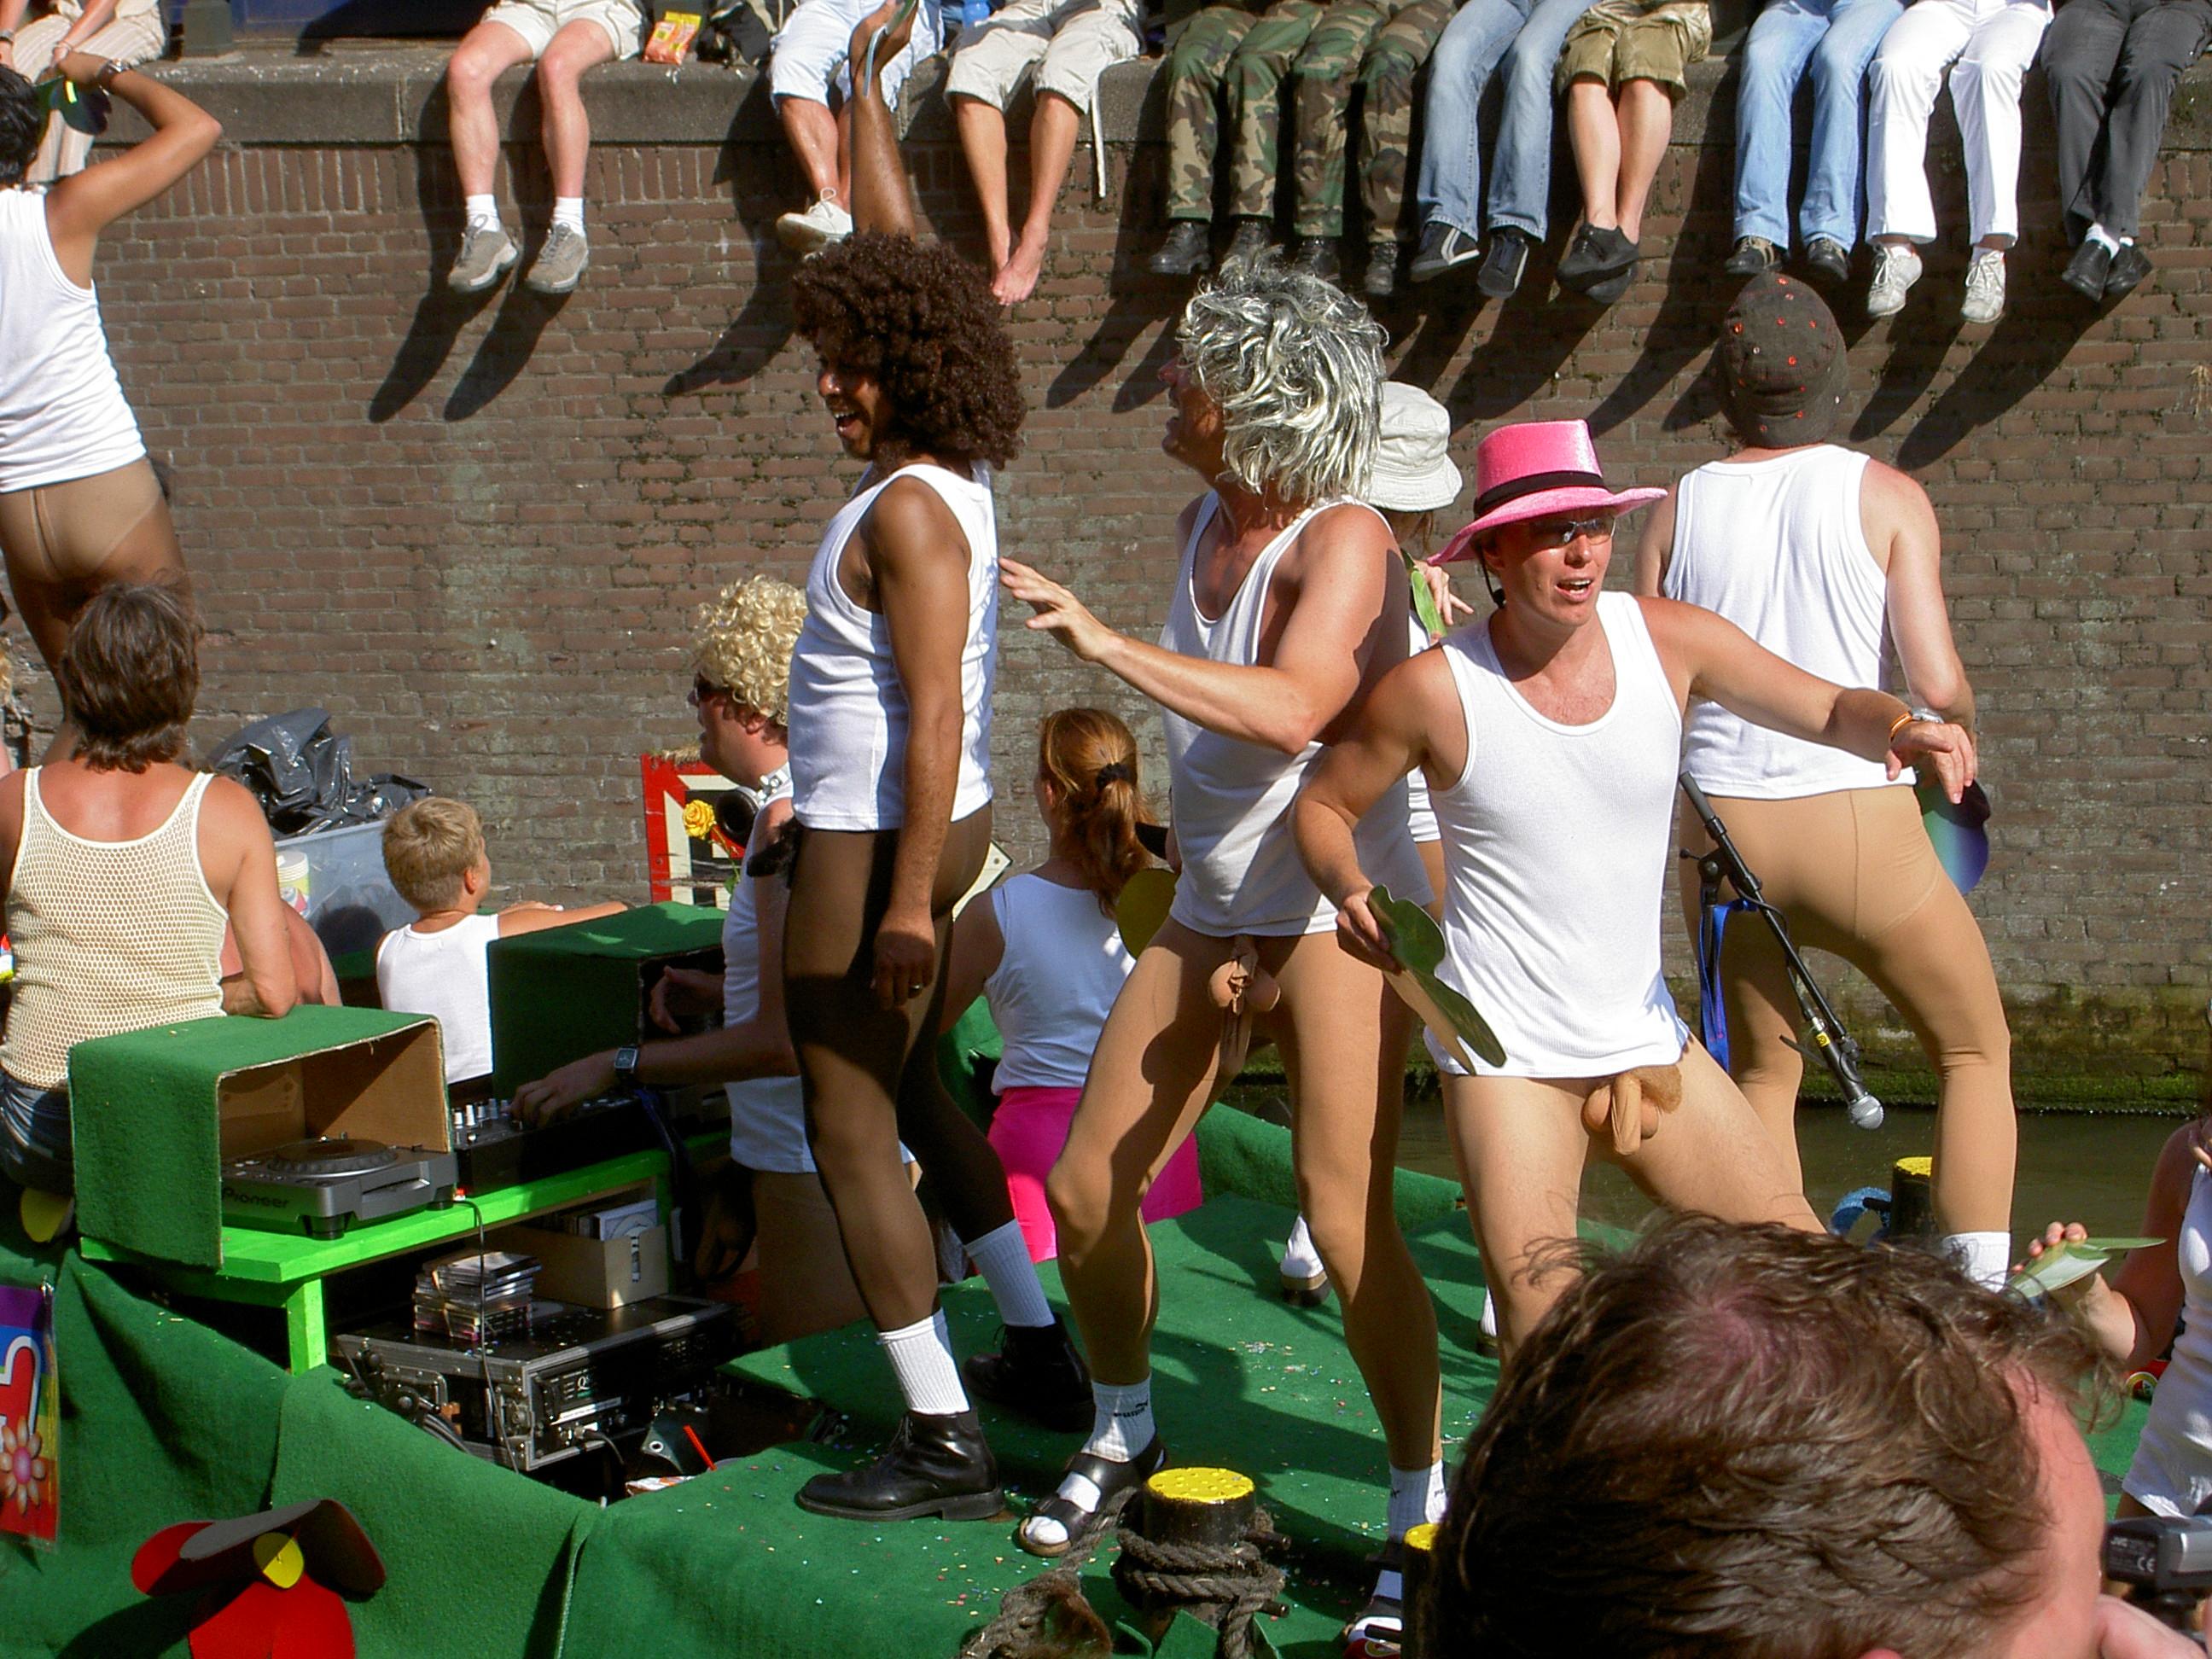 амстердам гей